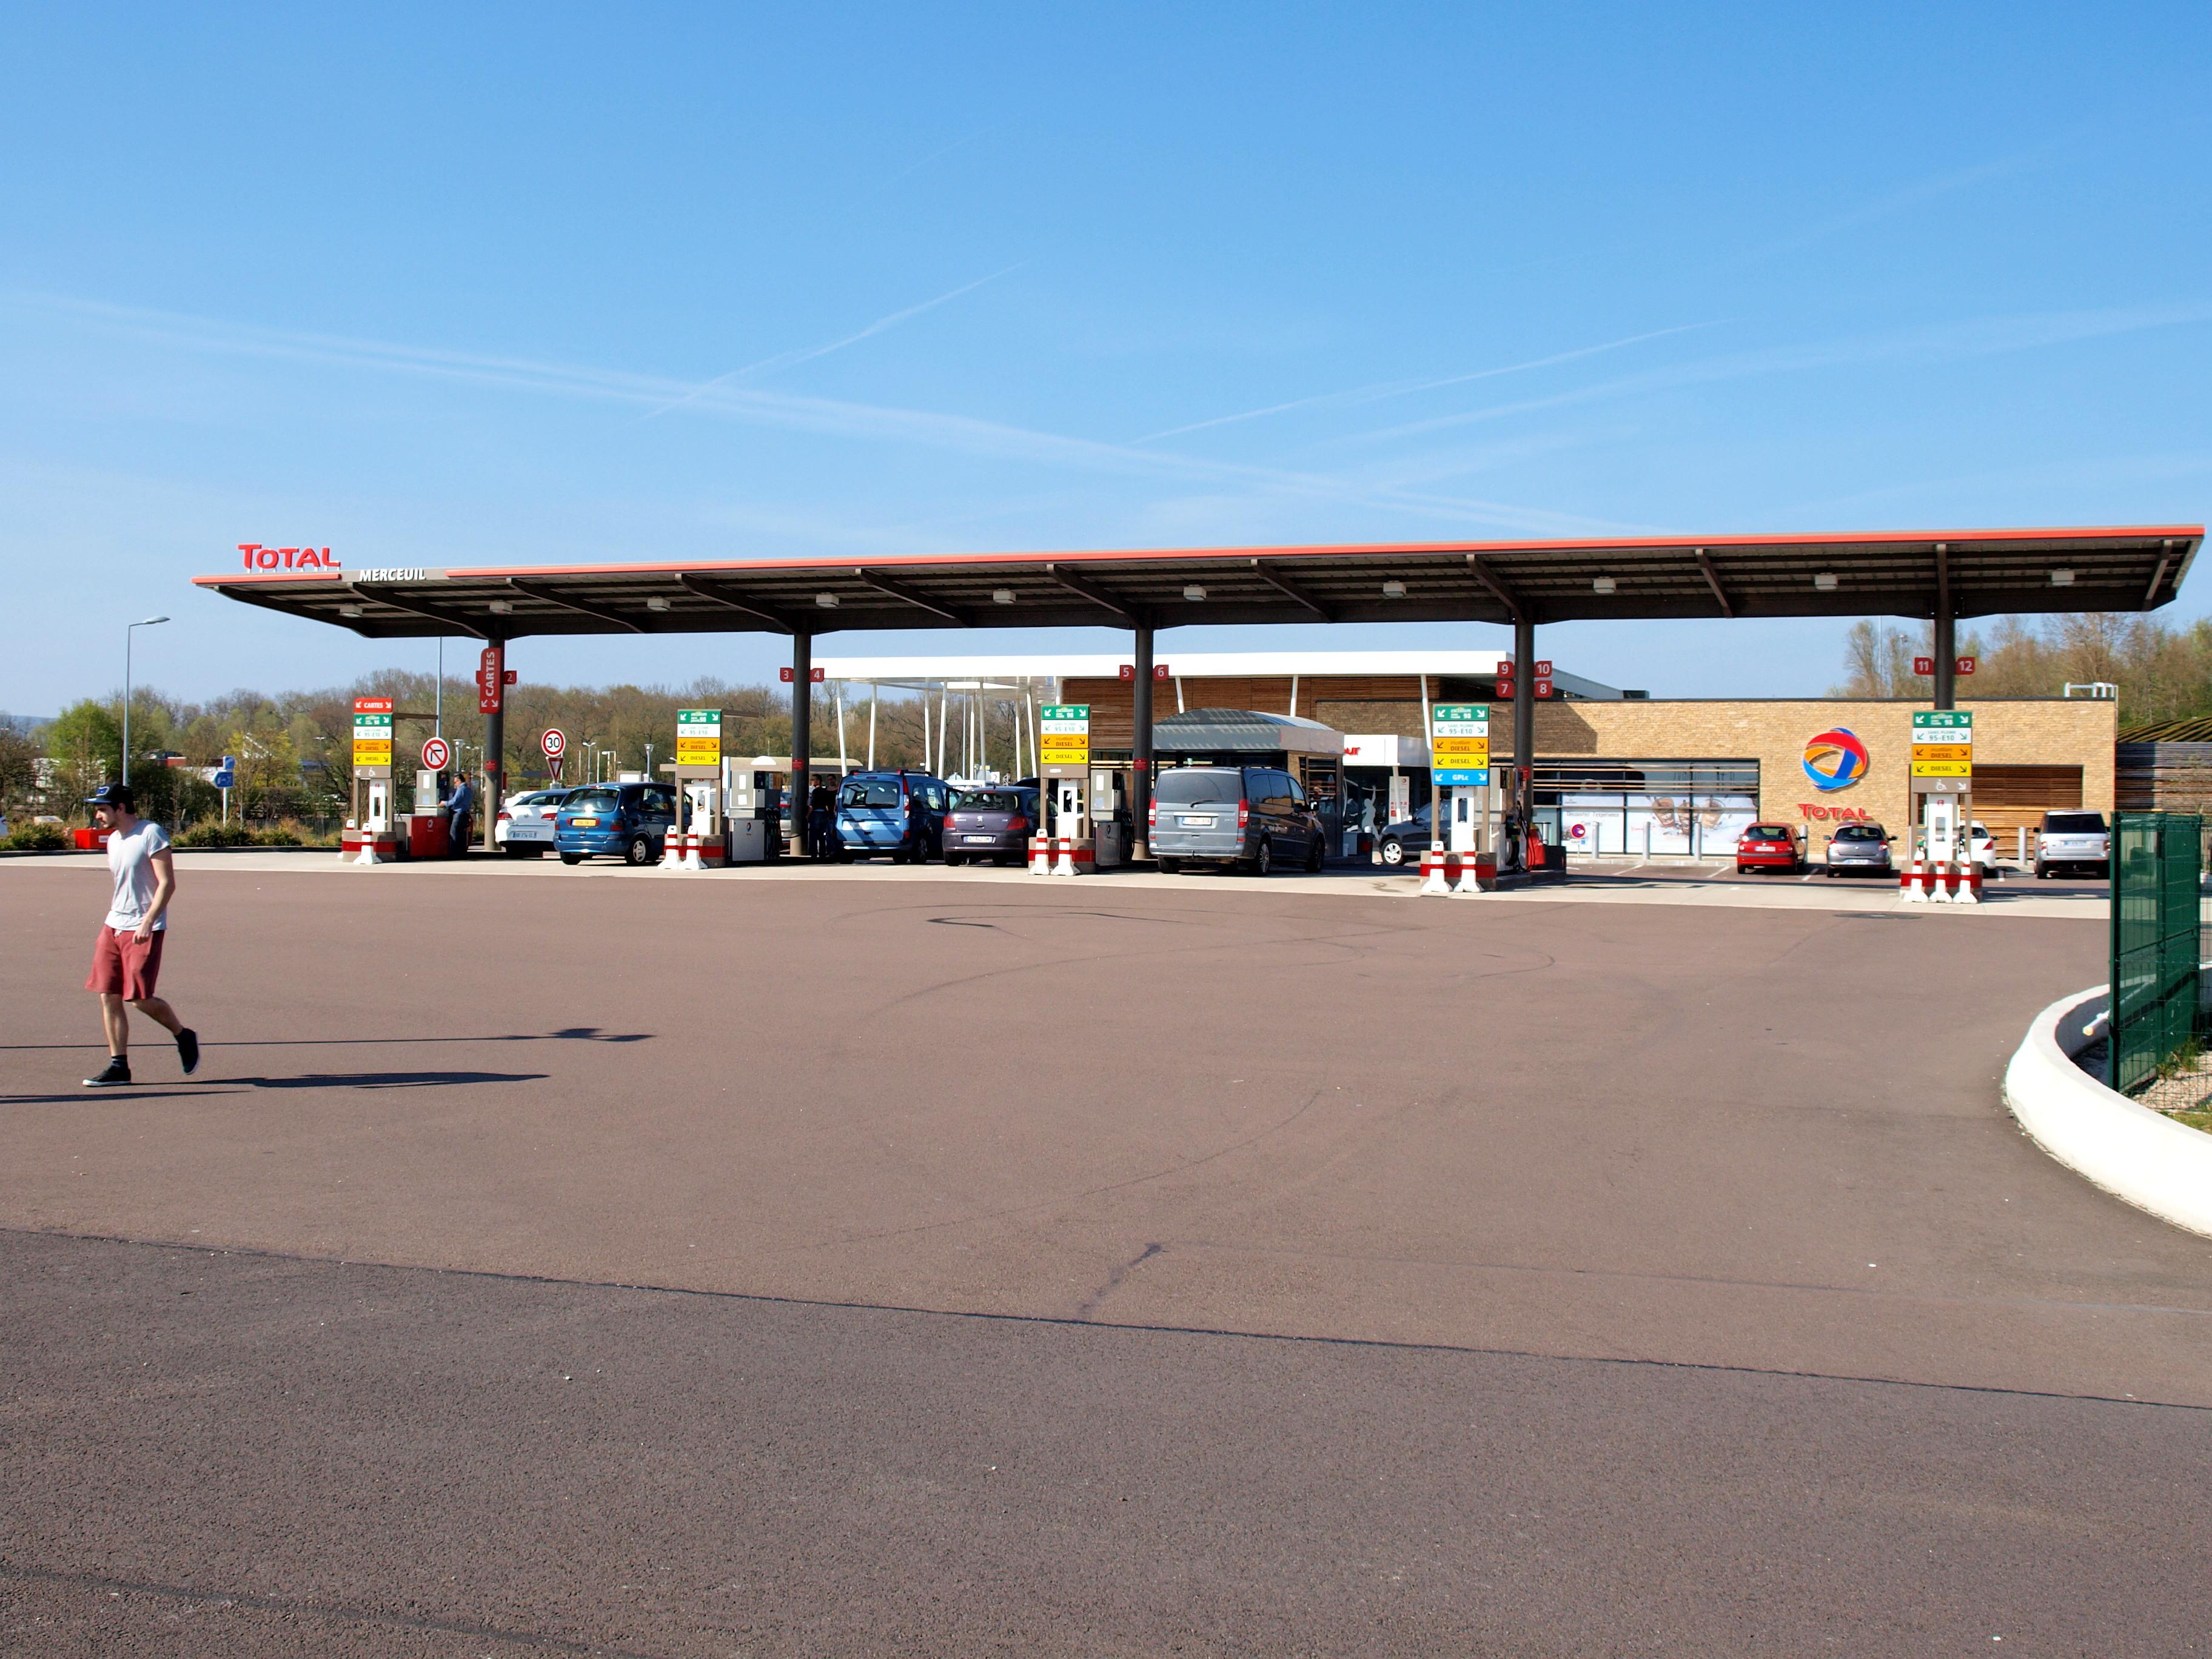 file:merceuil-fr-21-autoroute a6-aire de repos-06 - wikimedia